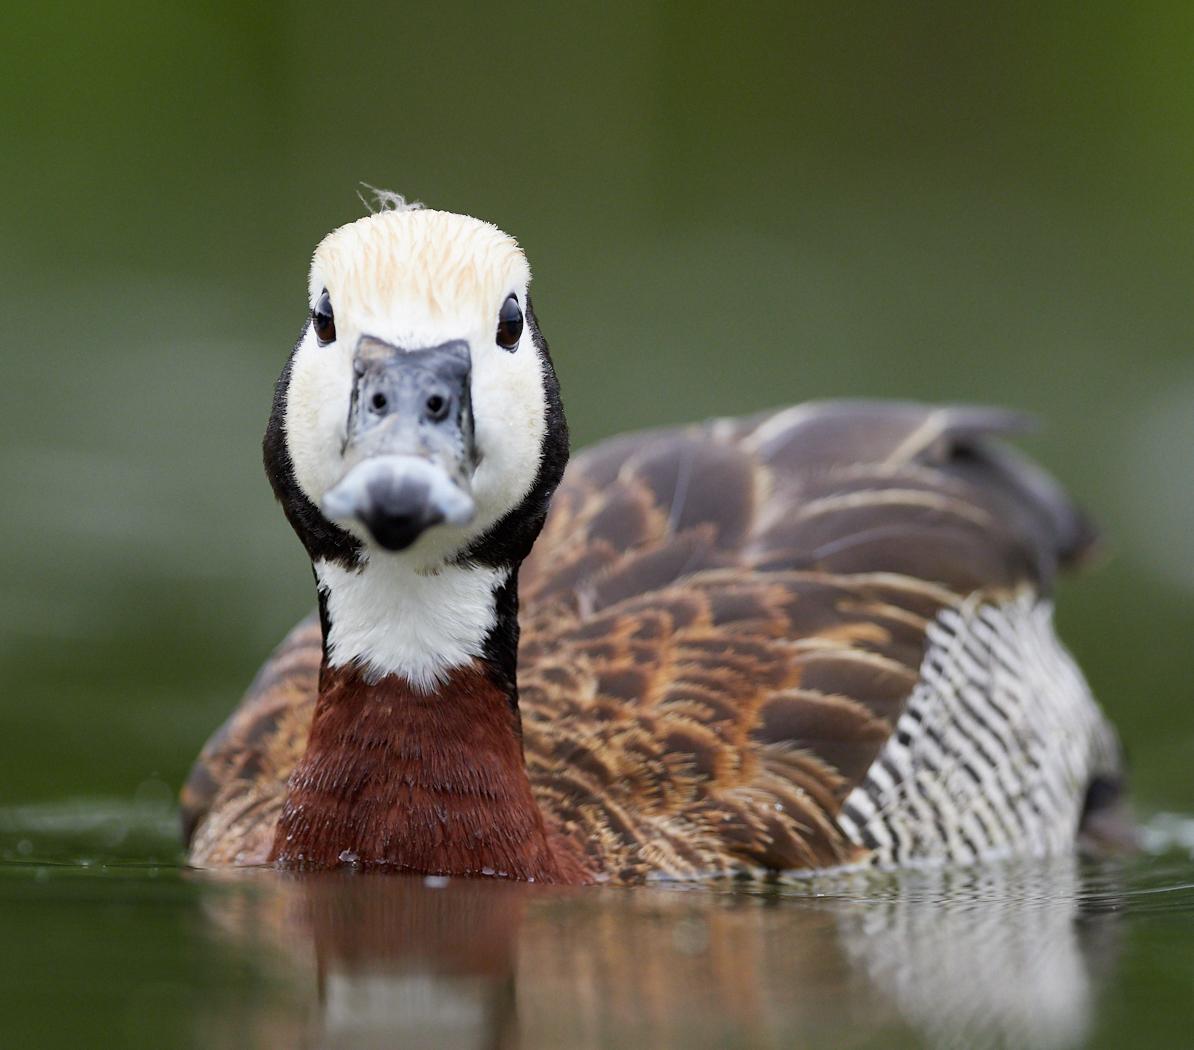 Duck1400x1050 sRGB 8.jpg